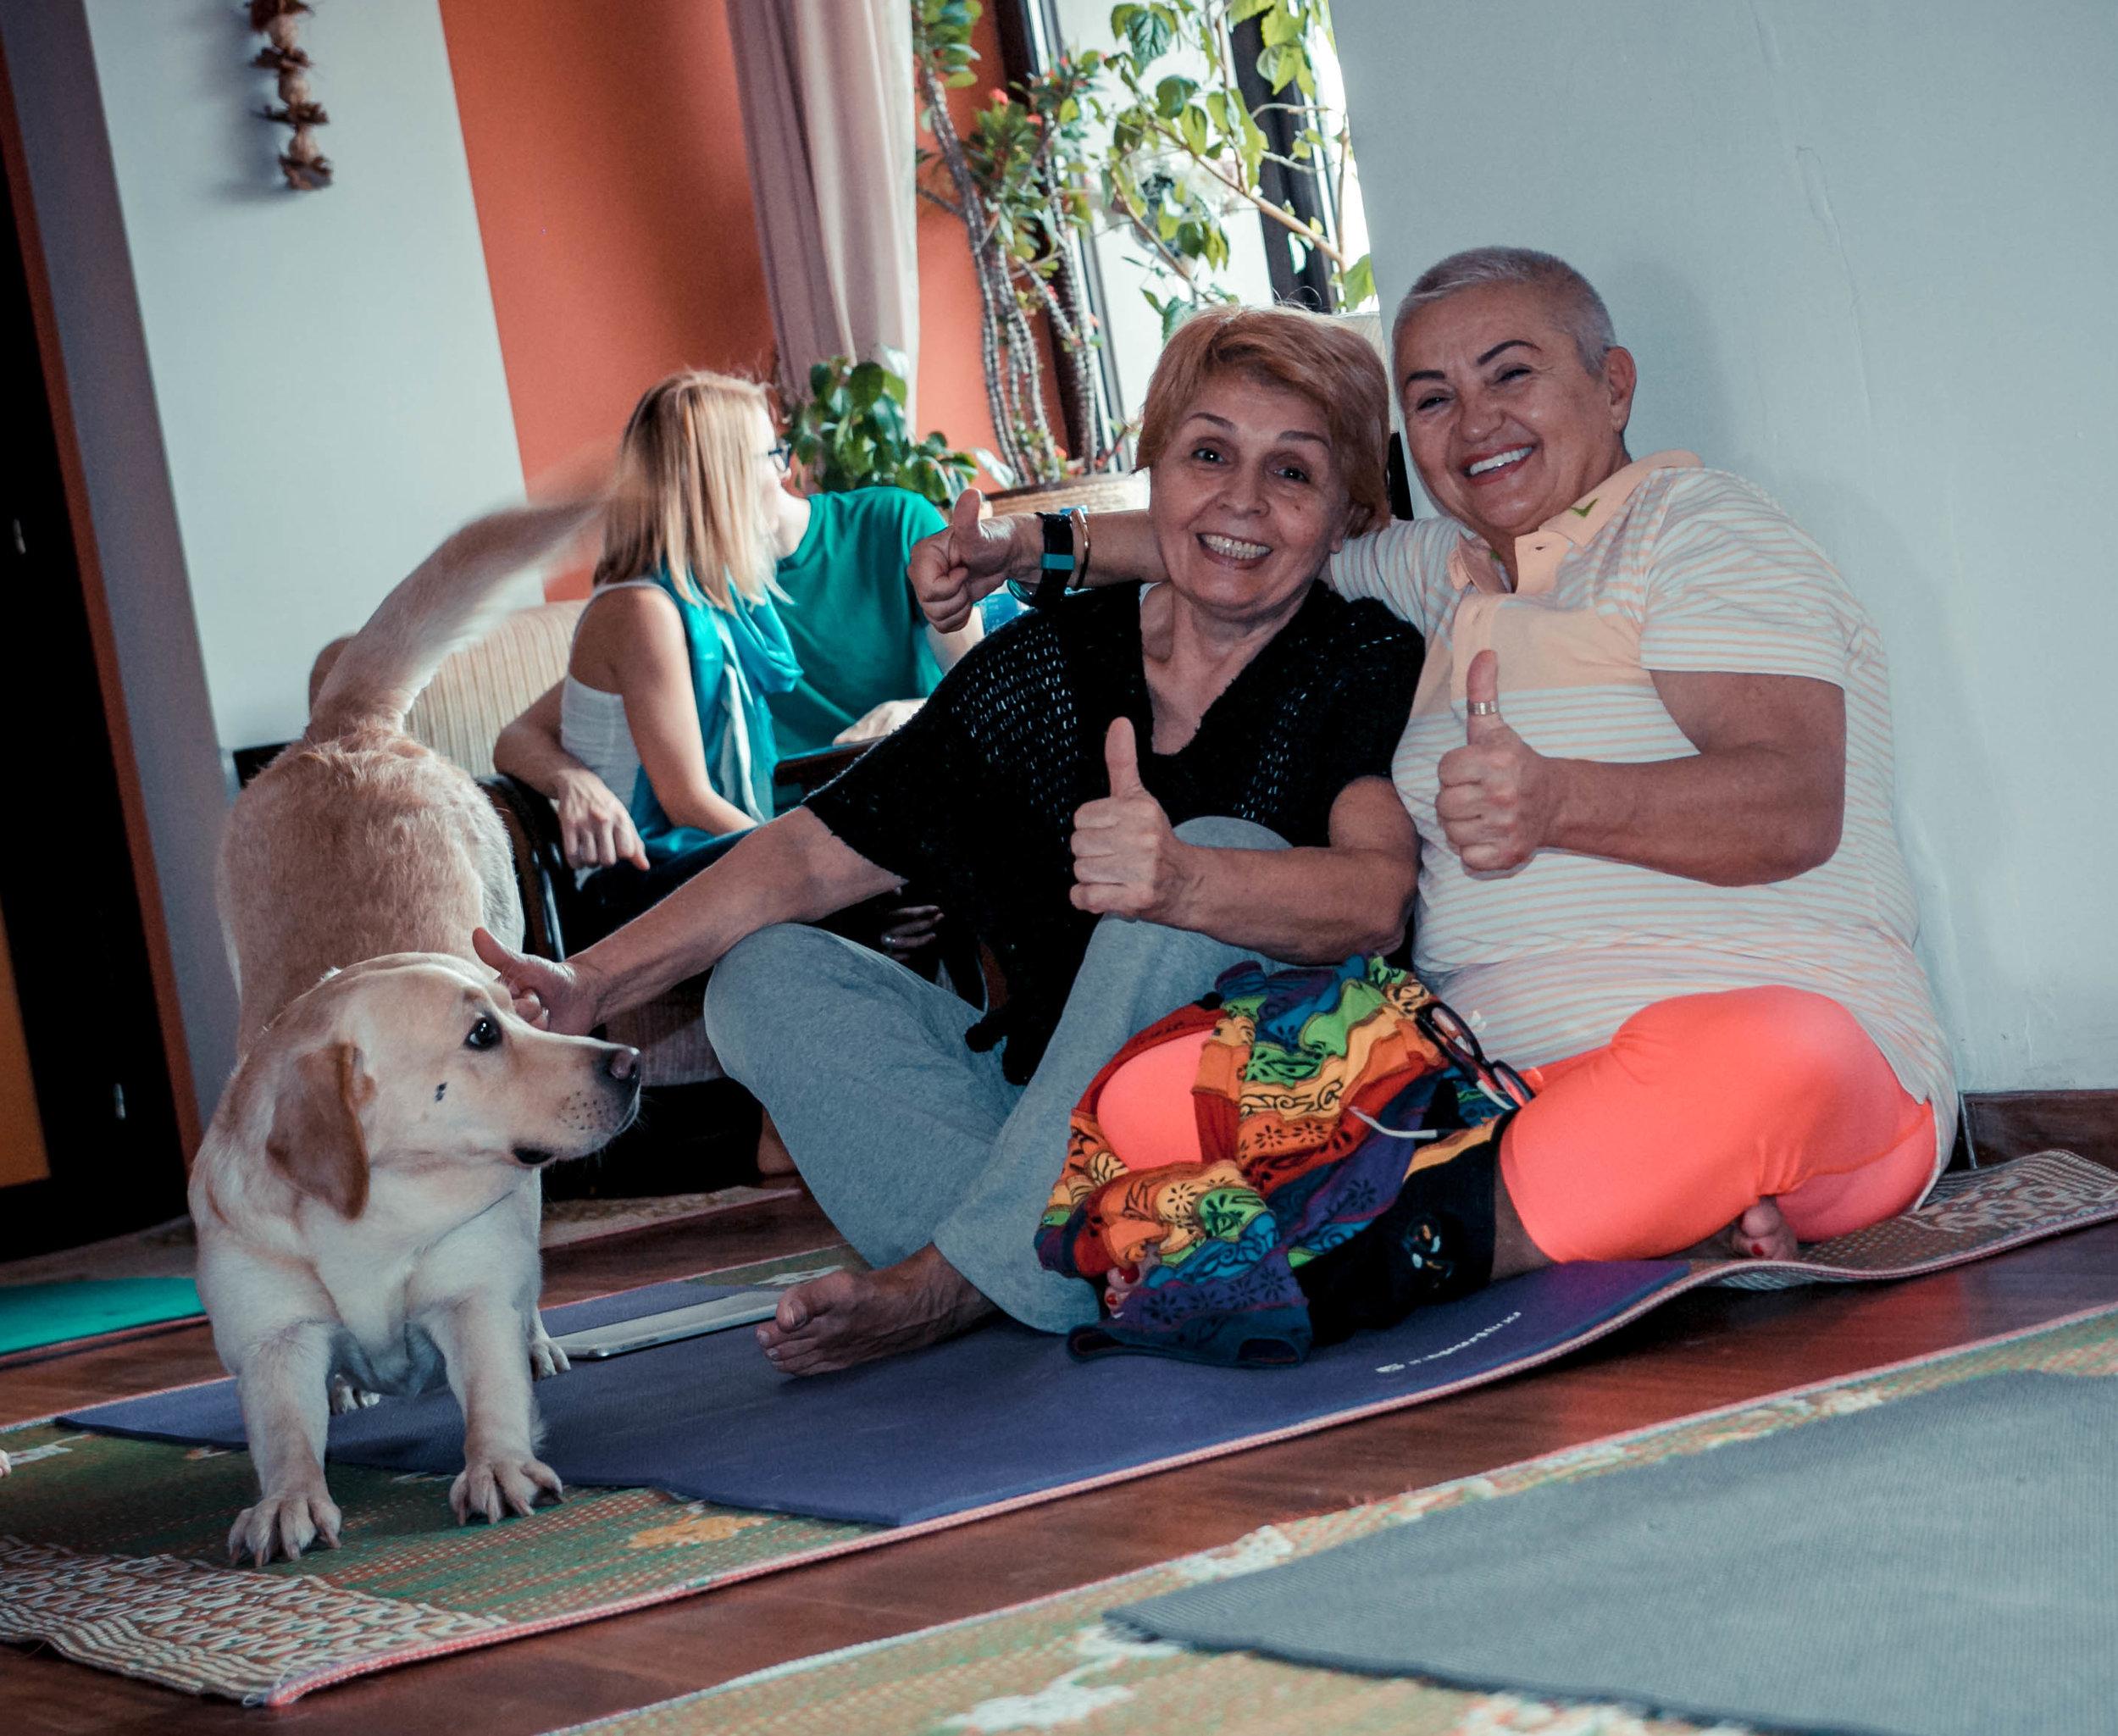 yoga bucuresti, postura, tabara de yoga, asana